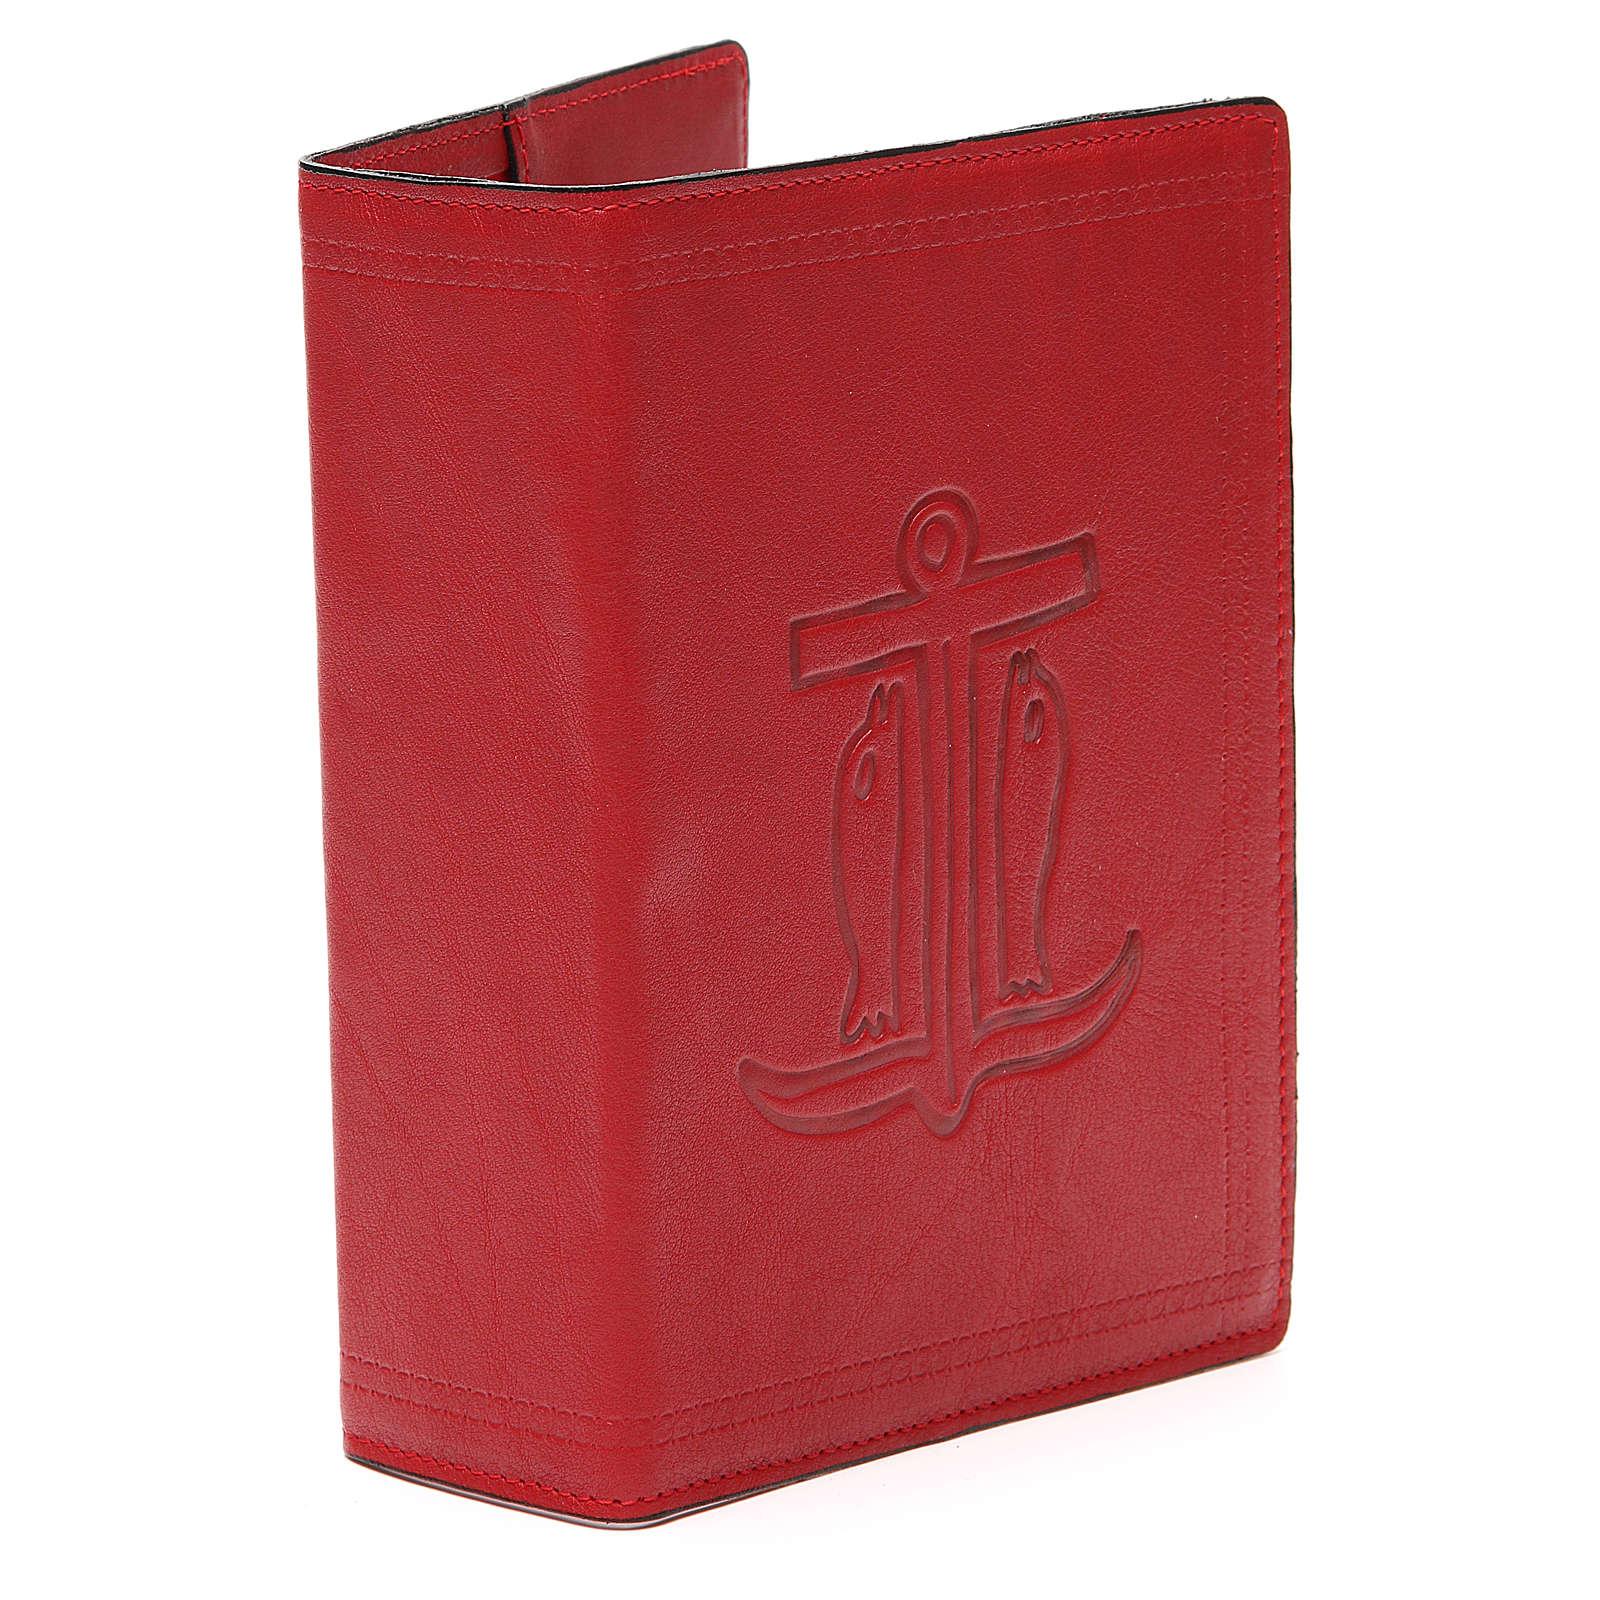 Copertina Bibbia Gerusalemme pelle rossa Ancora Salvezza 4